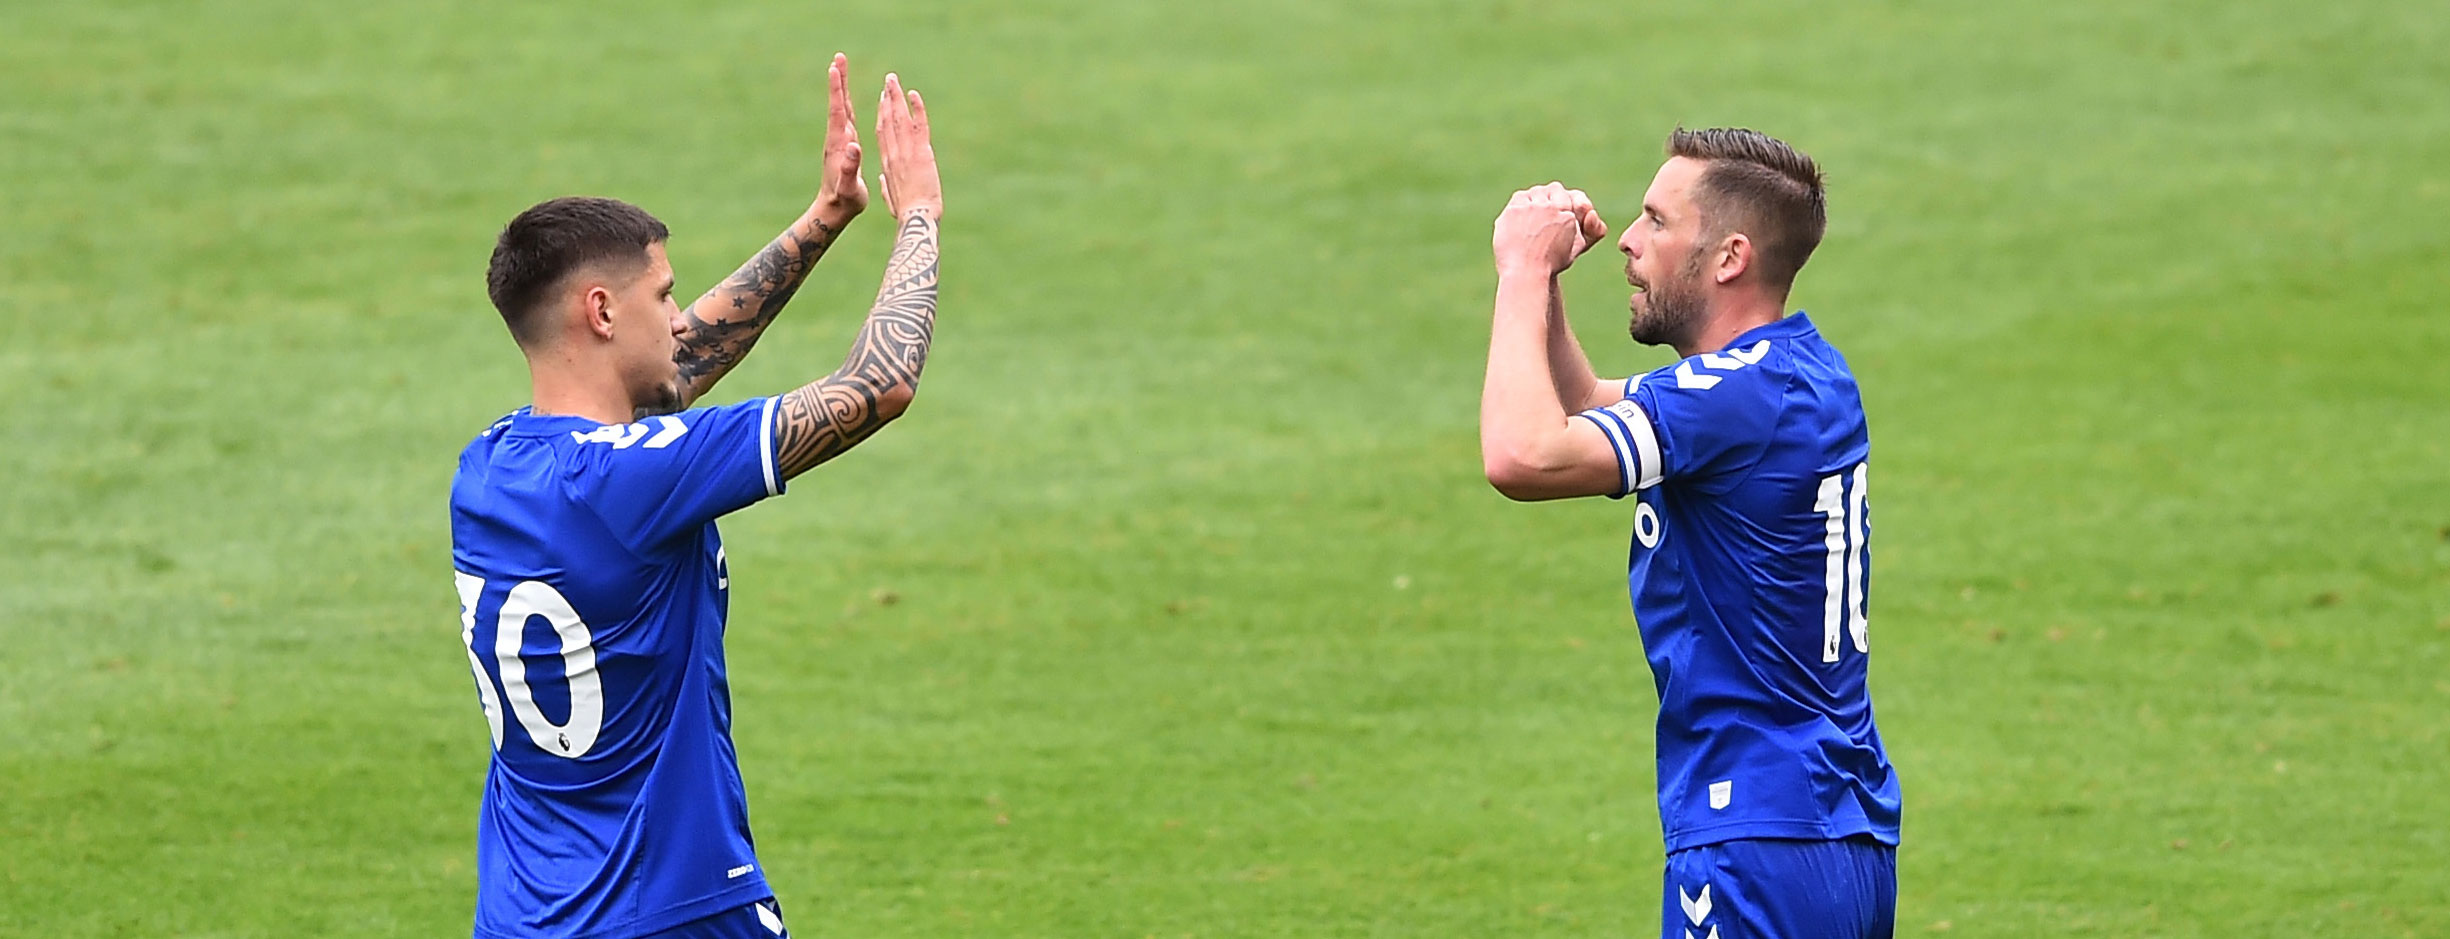 Everton vs Southampton prediction, Premier League, football